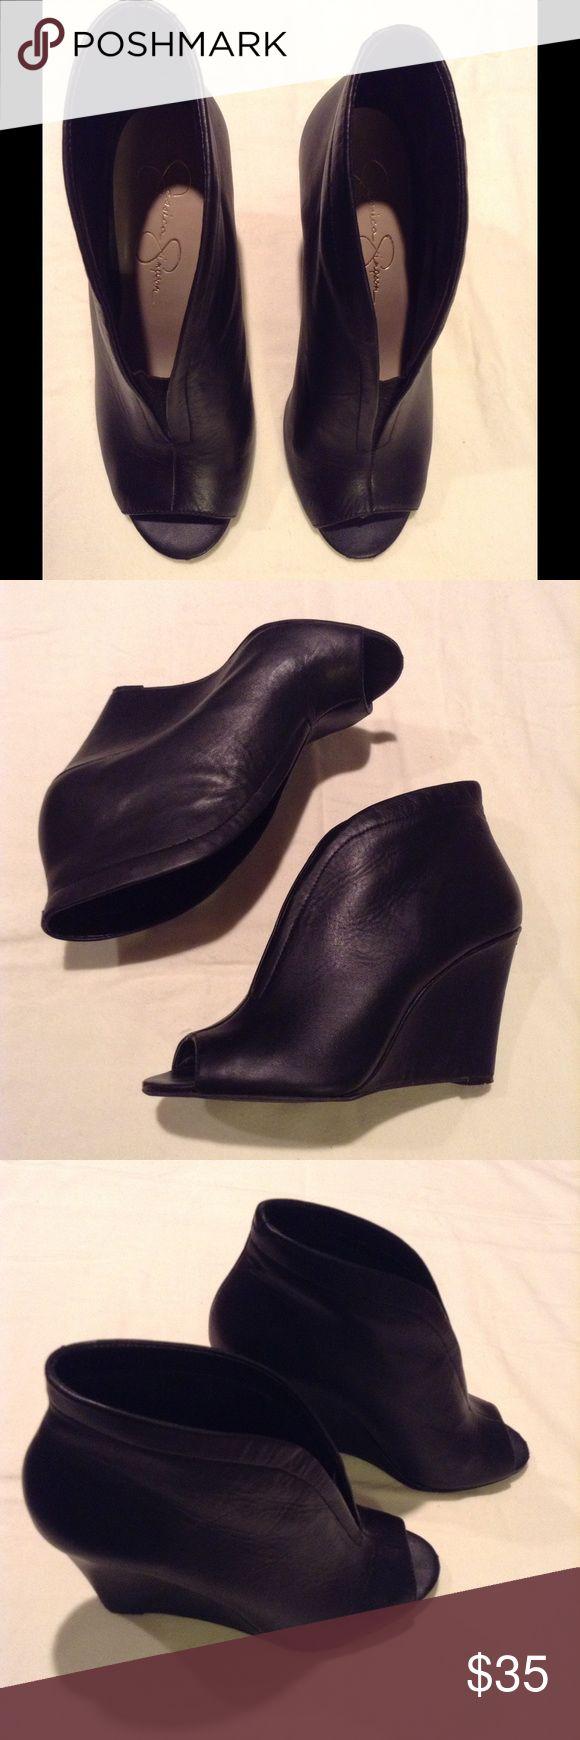 Jessica Simpson black open-toe wedge booties  Black open-toe wedge booties, genuine leather 4inch heel, Jessica Simpson. Very good condition! ❤️ Jessica Simpson Shoes Ankle Boots & Booties